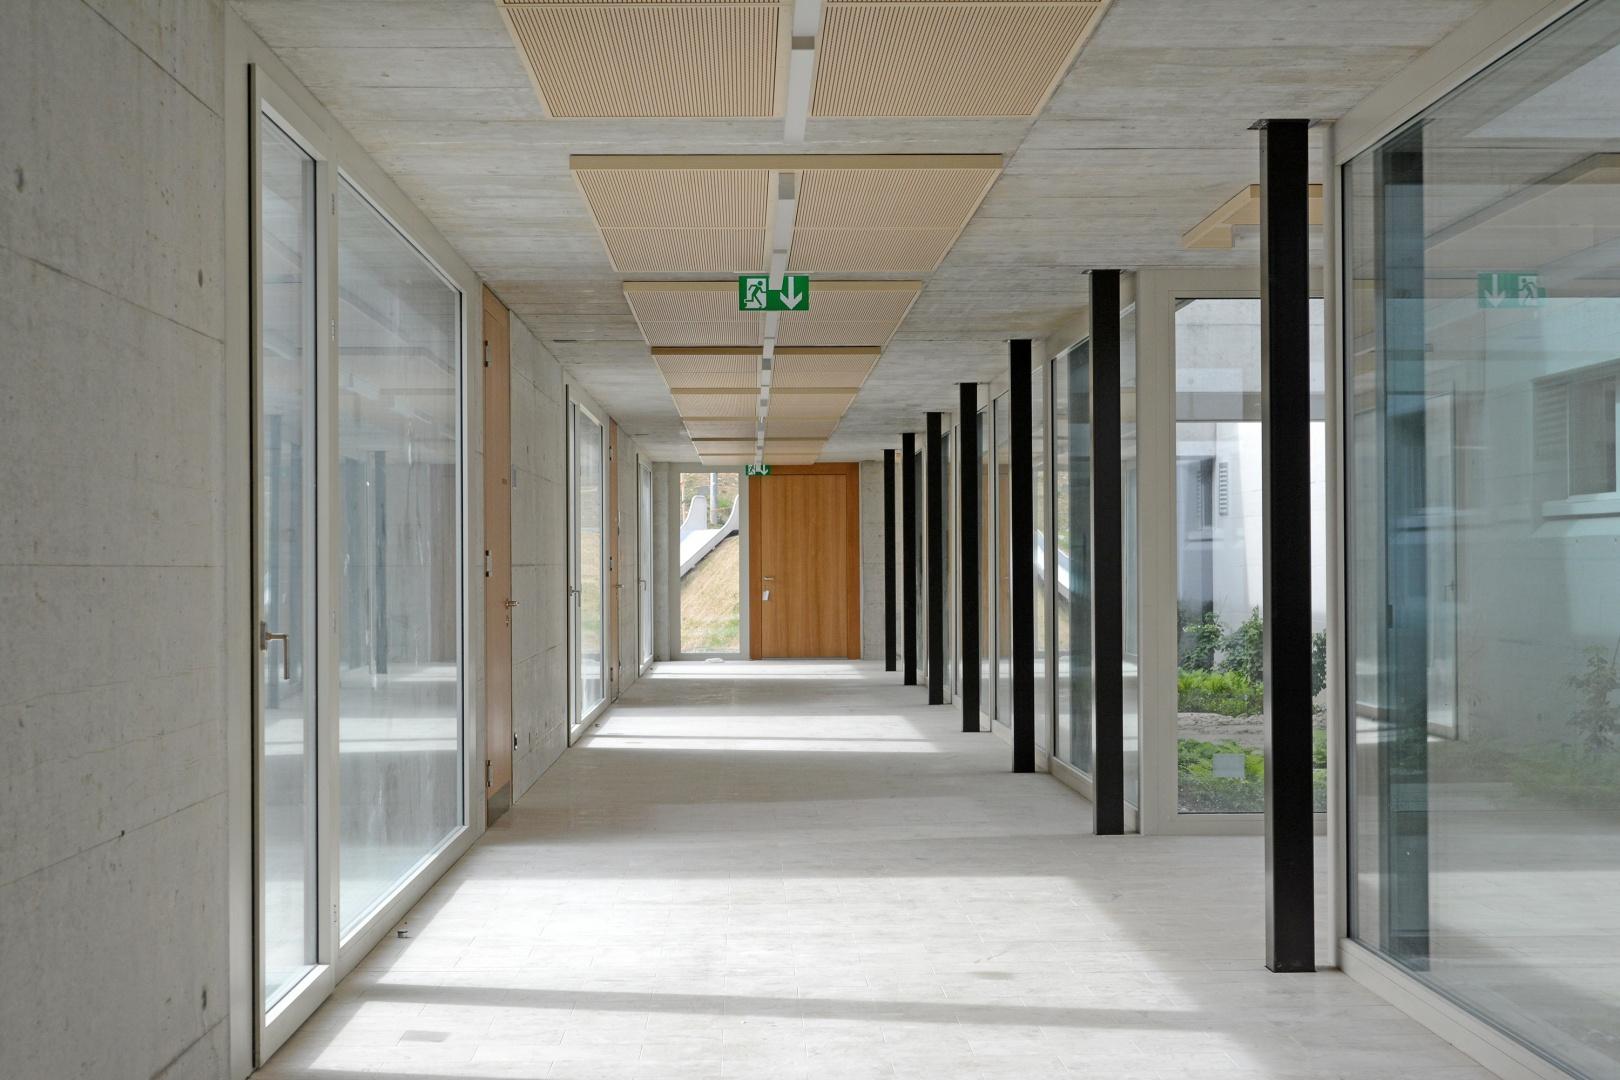 Korridor Kindergärten © Hopf & Wirth Architekten, Rychenbergstrasse 2,  8400 Winterthur